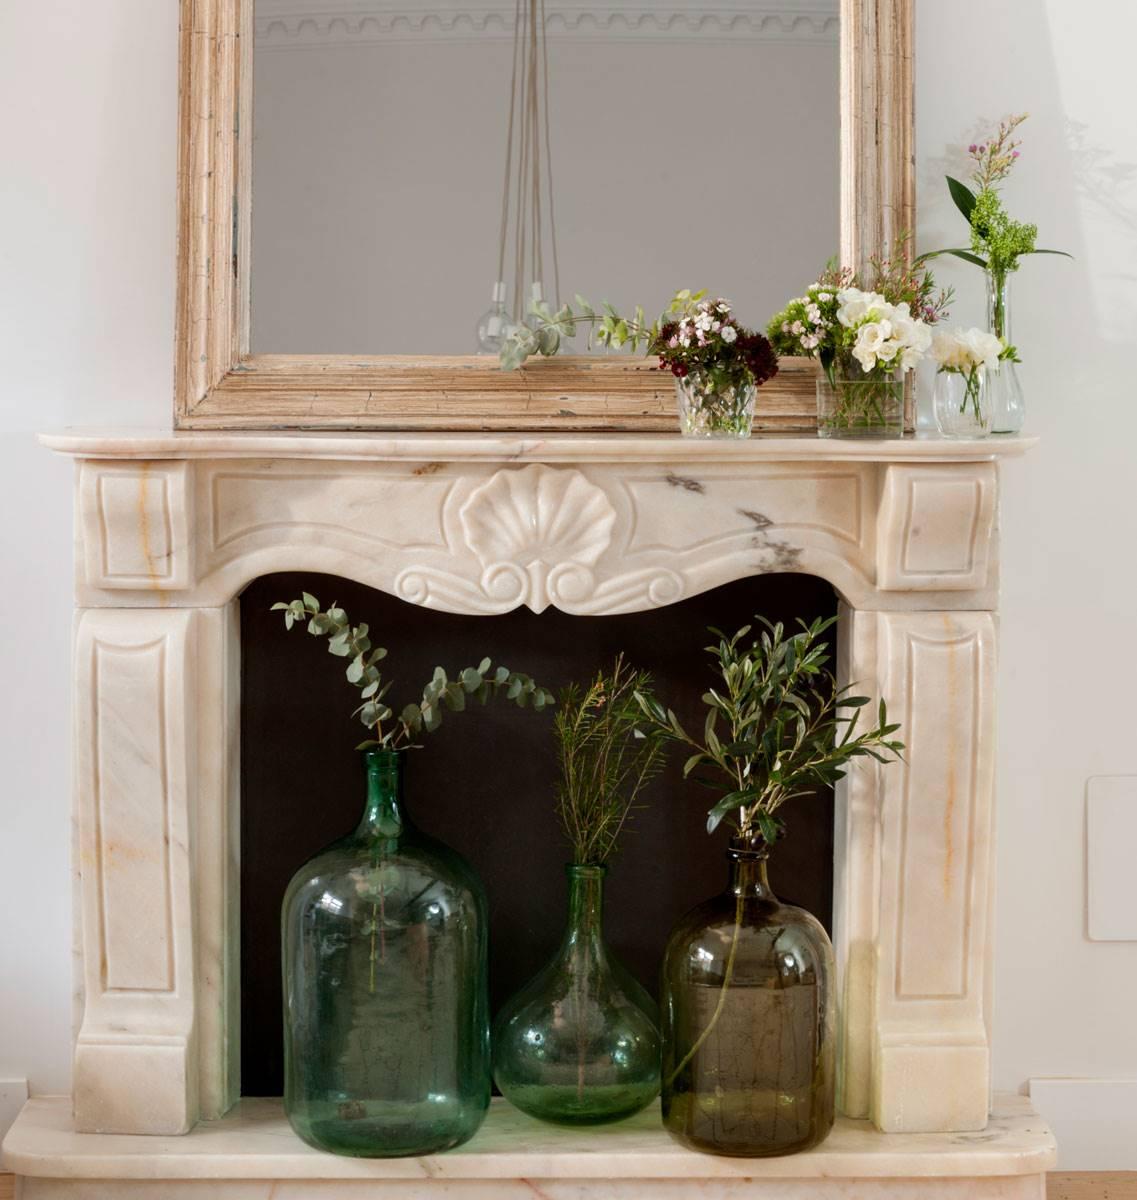 chimenea-de-marmol-blanco-con-tres-jarrones-tonalidades-verdes-con-eucaliptus-y-romero 00452048 O. Romero